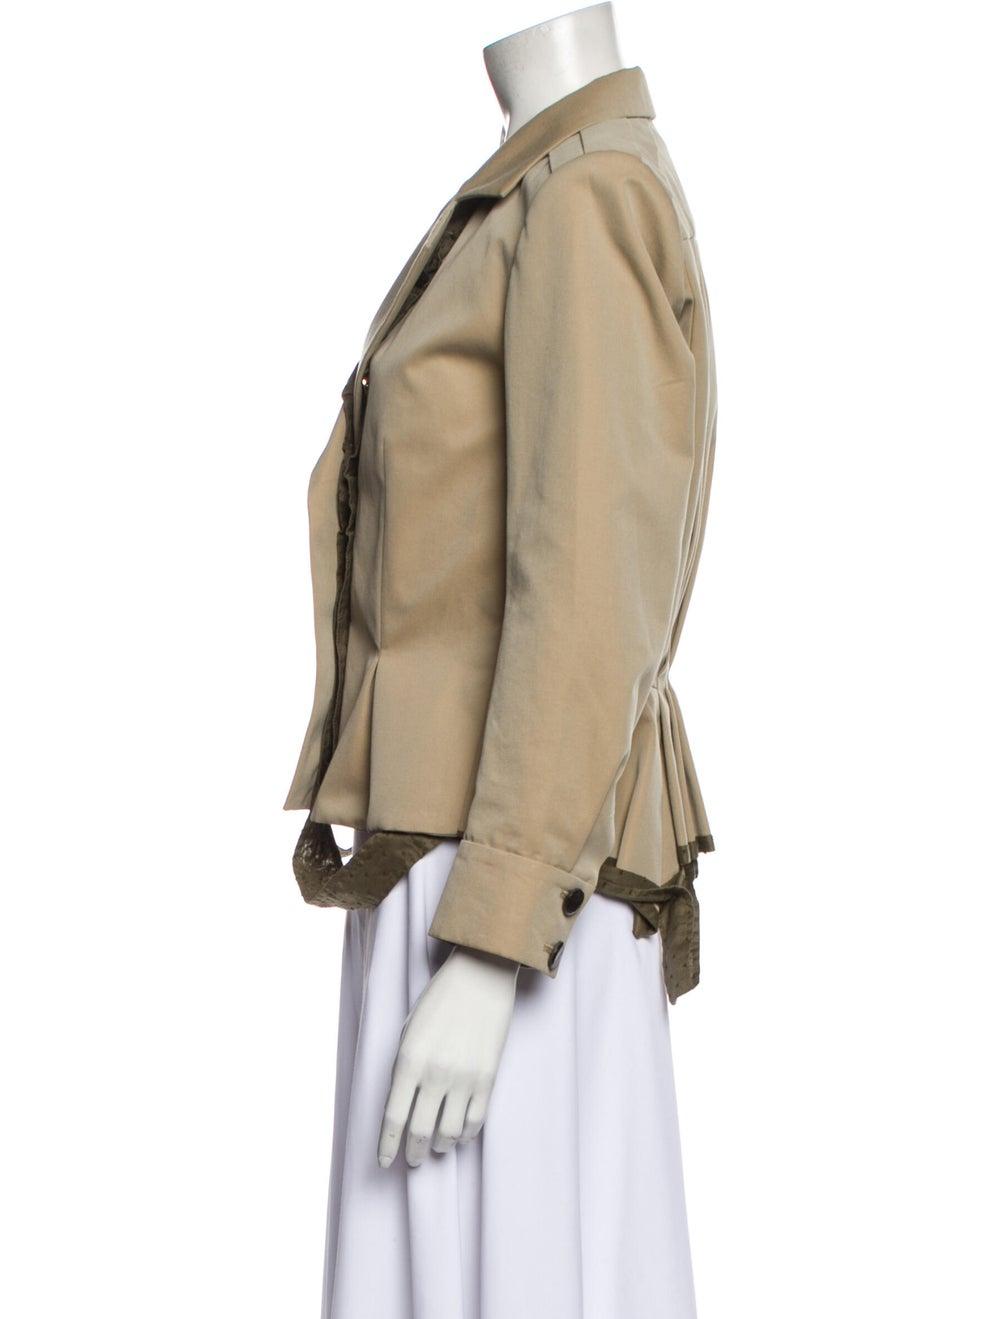 Yves Saint Laurent Rive Gauche Blazer - image 2